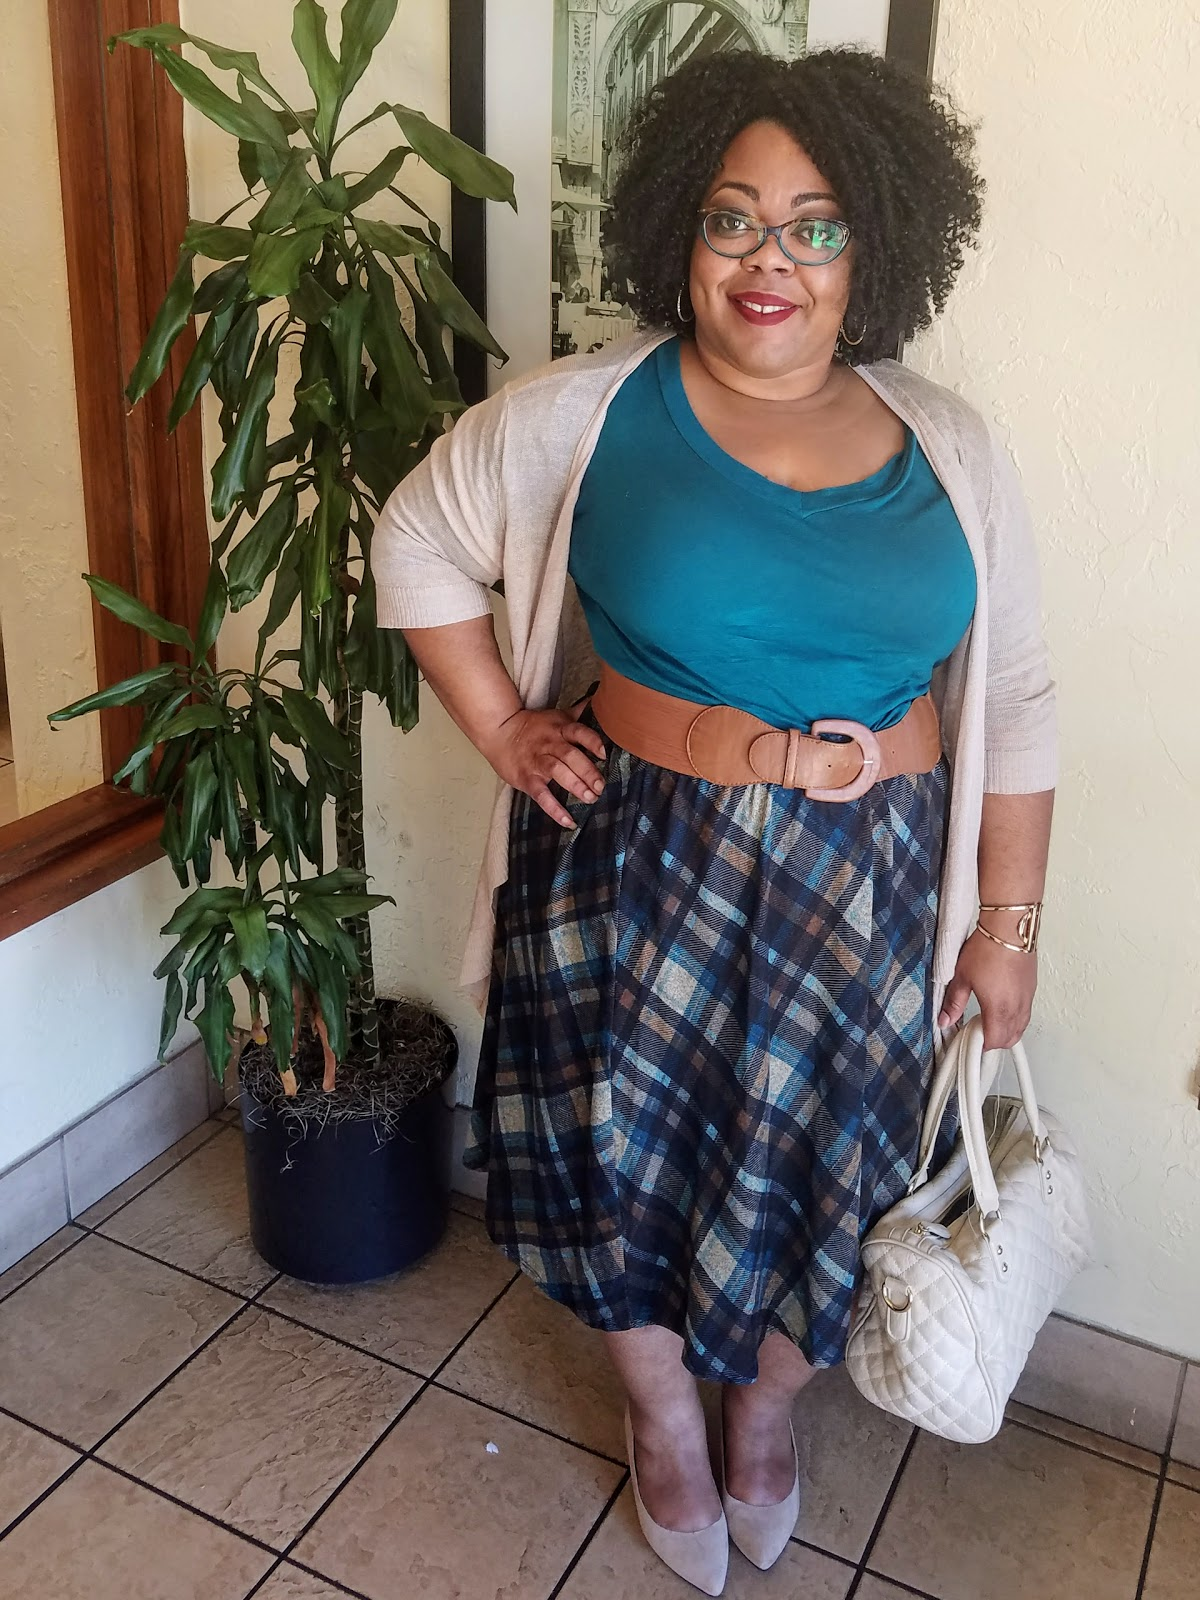 curvy, plus size, full figured, natural hair, plaid skirt, knit tee, cardigan, kitten heels